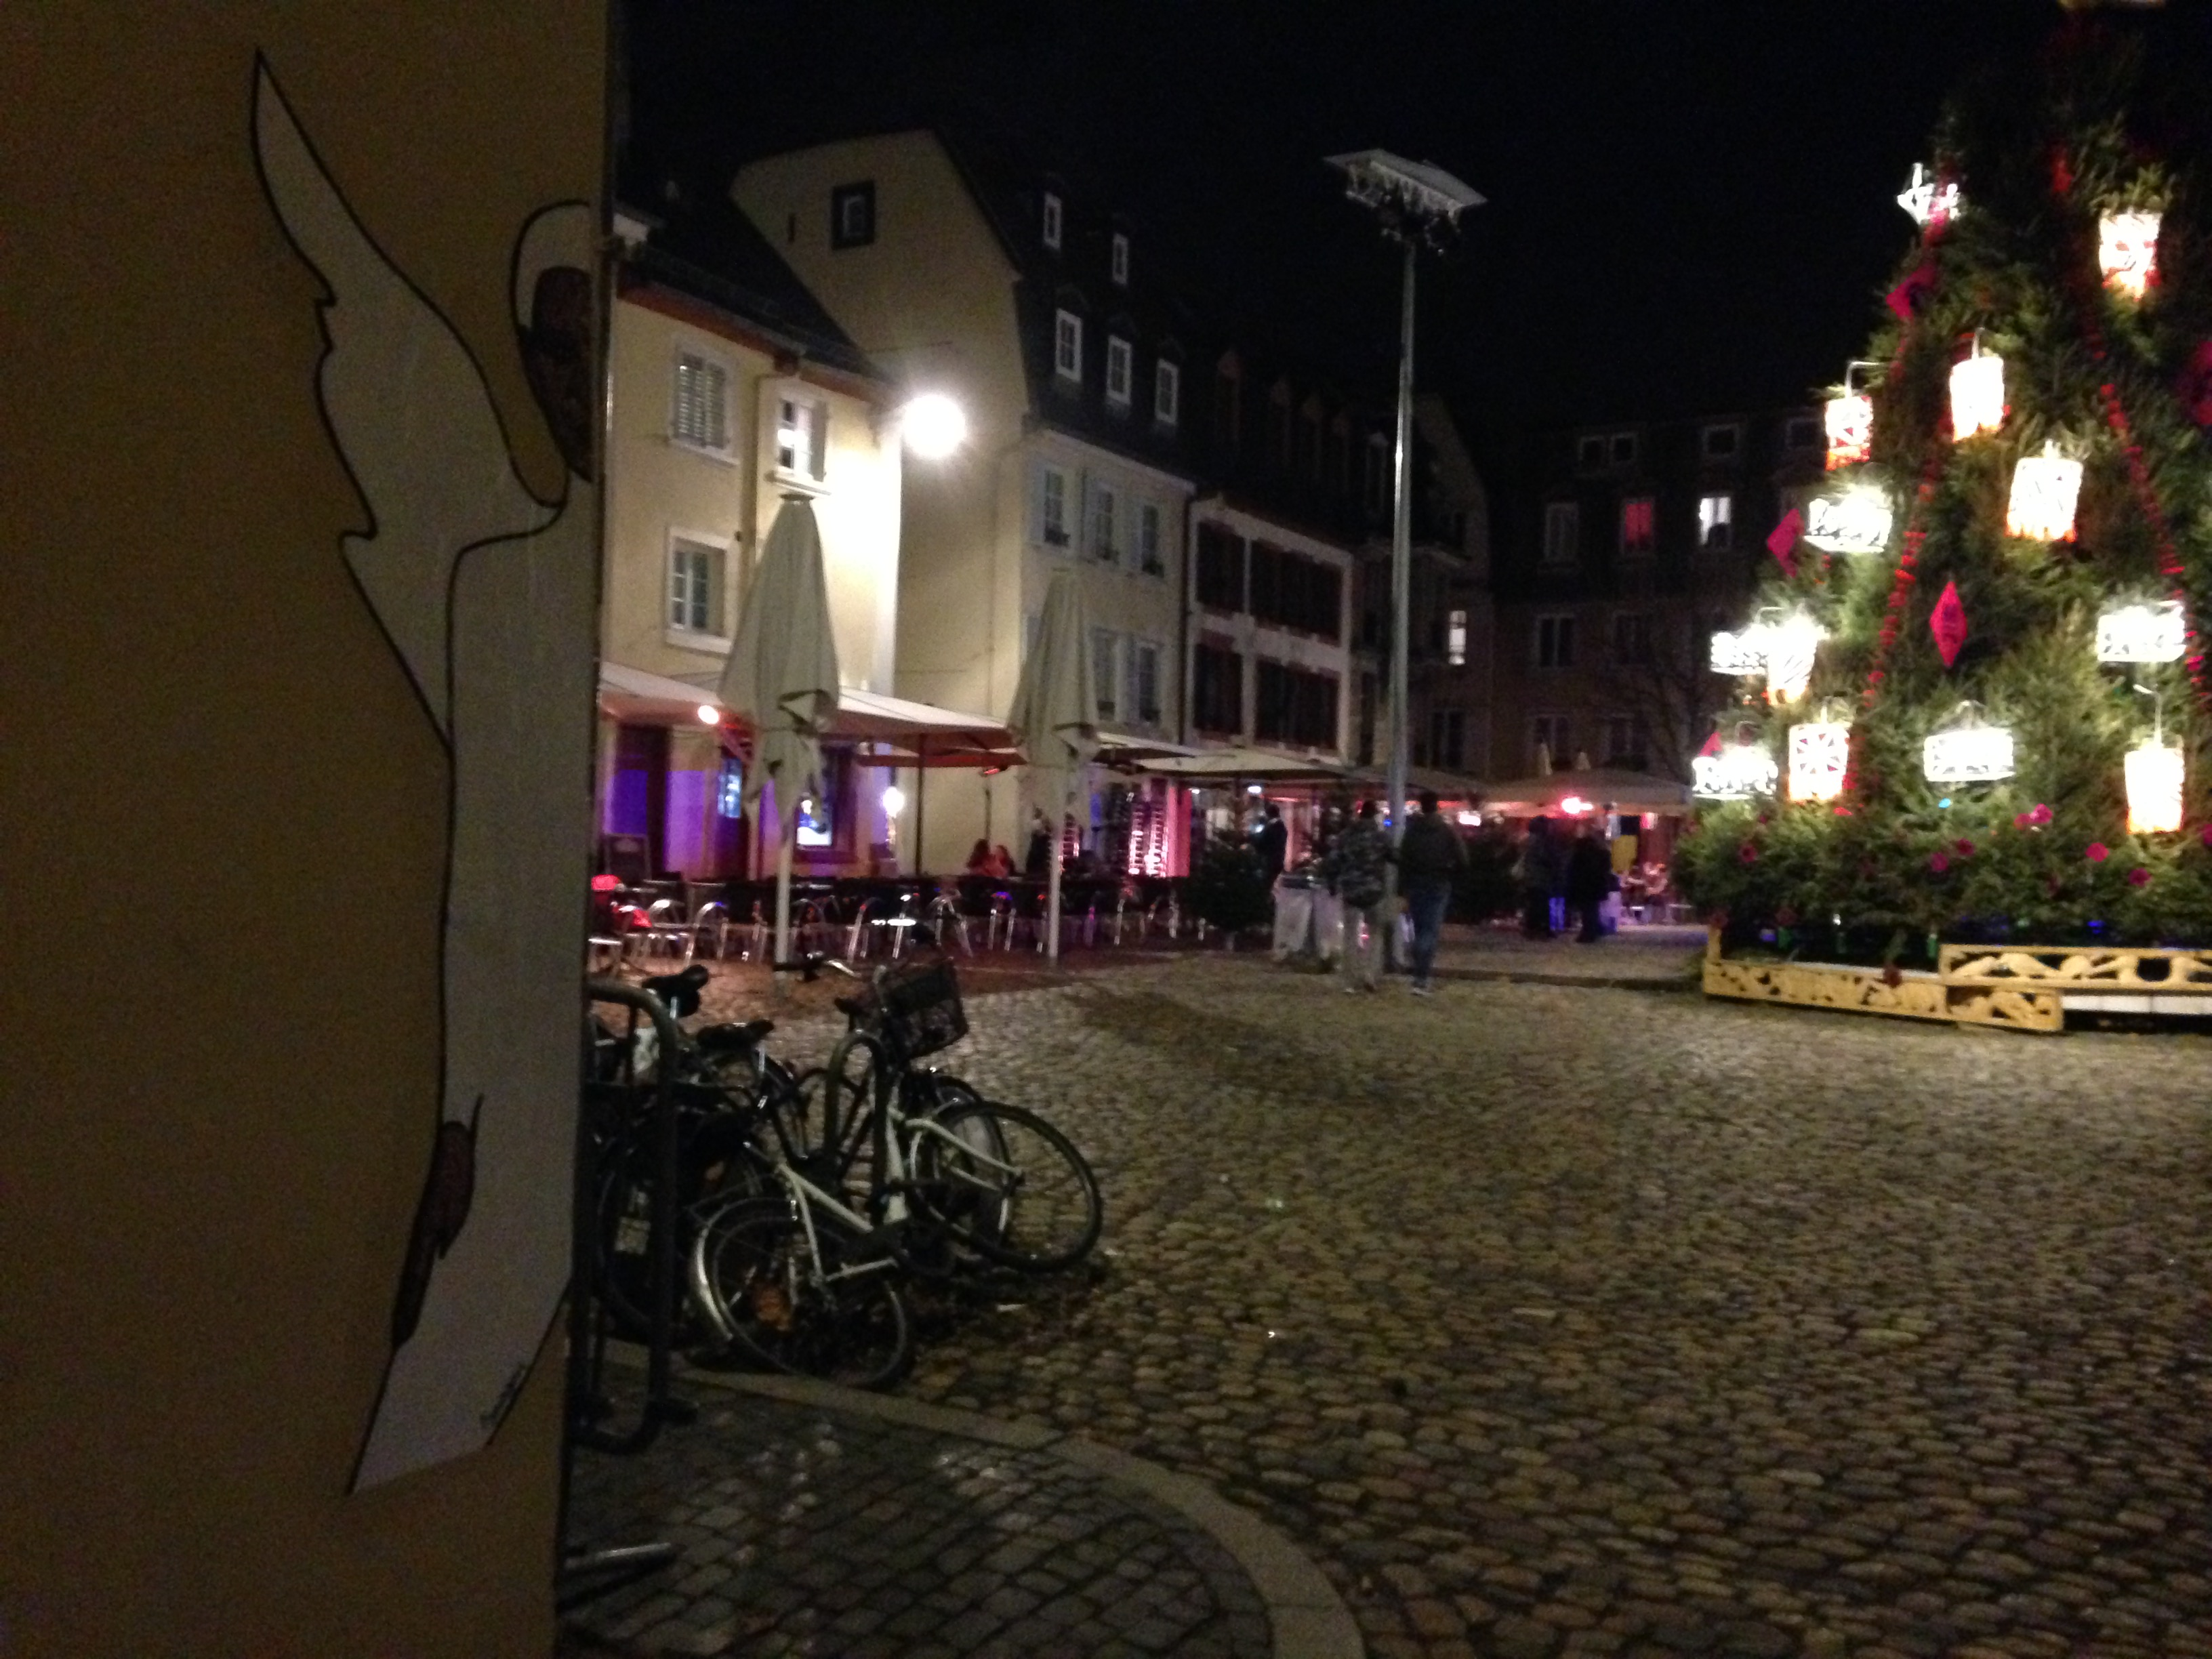 Colombe de la paix - Strasbourg